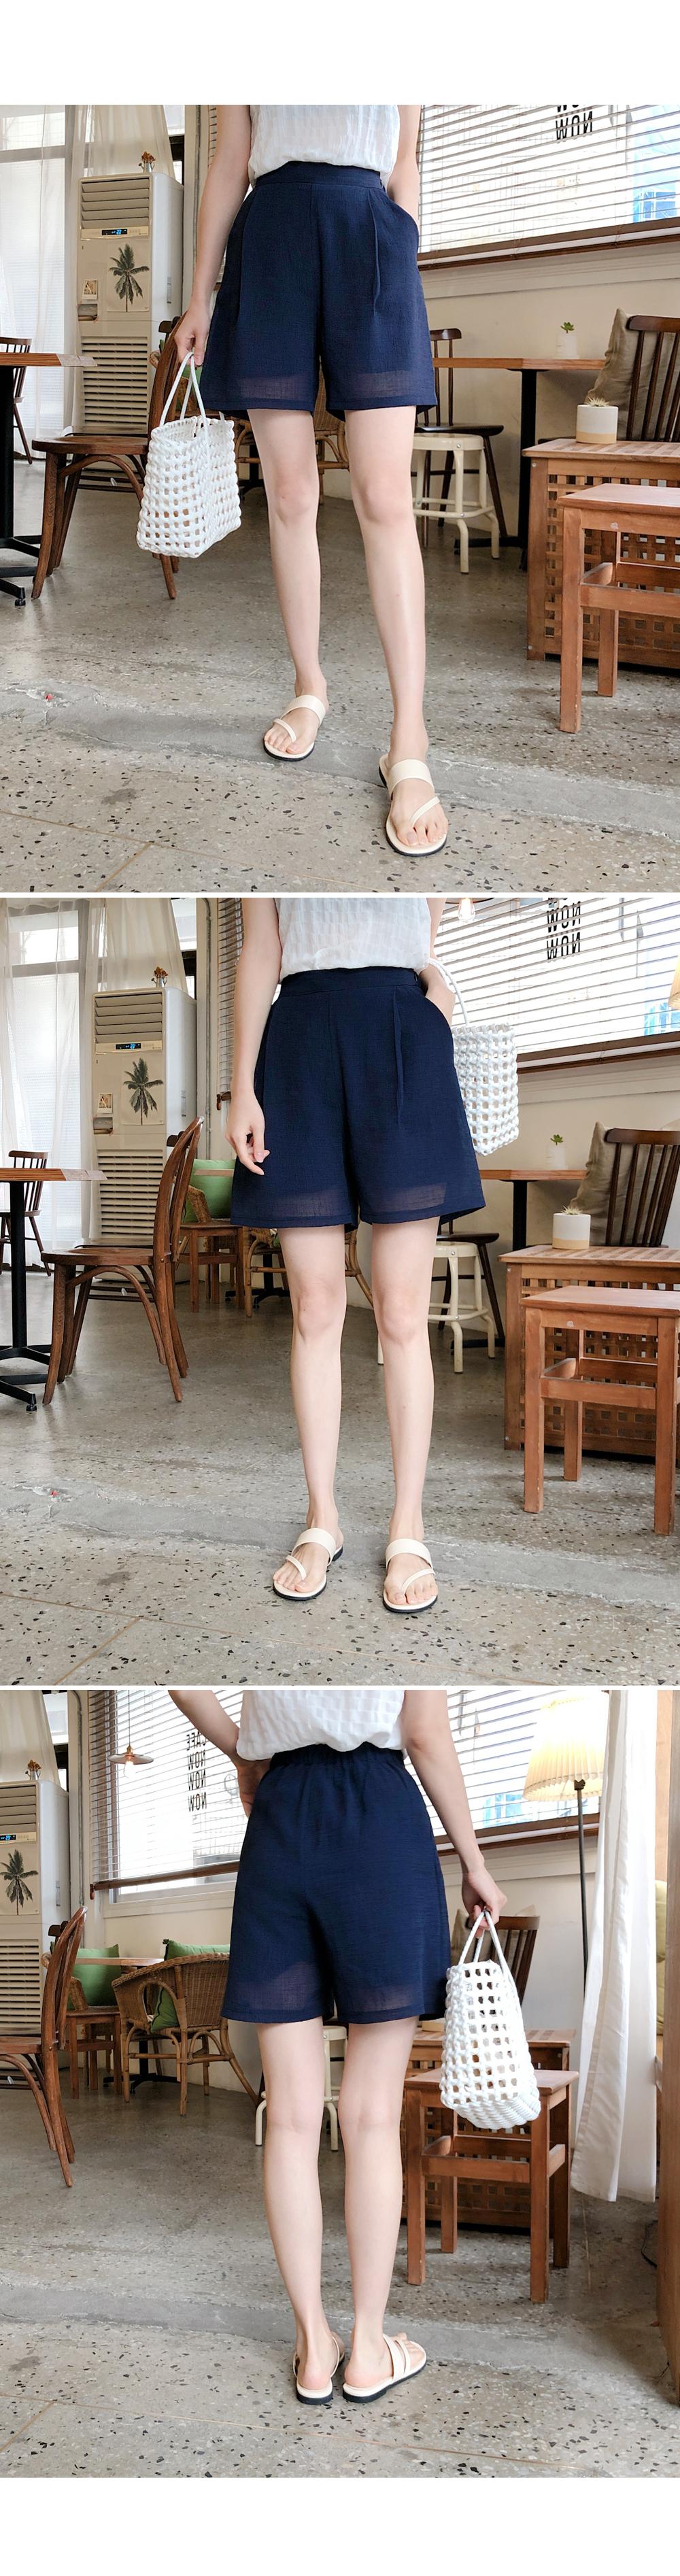 Cool soles pants